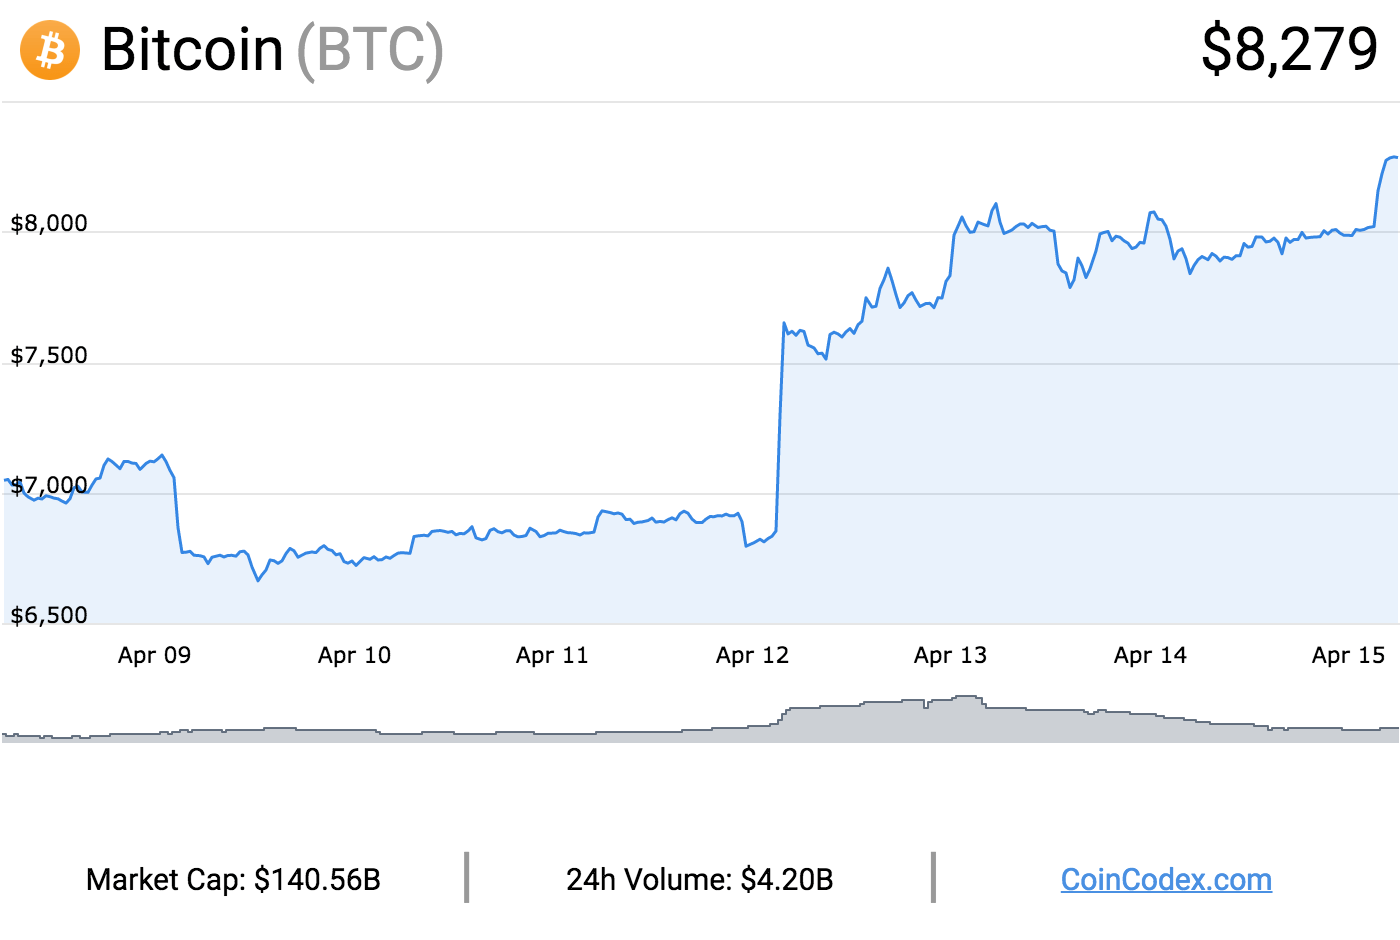 coincodex Bitcoin graph